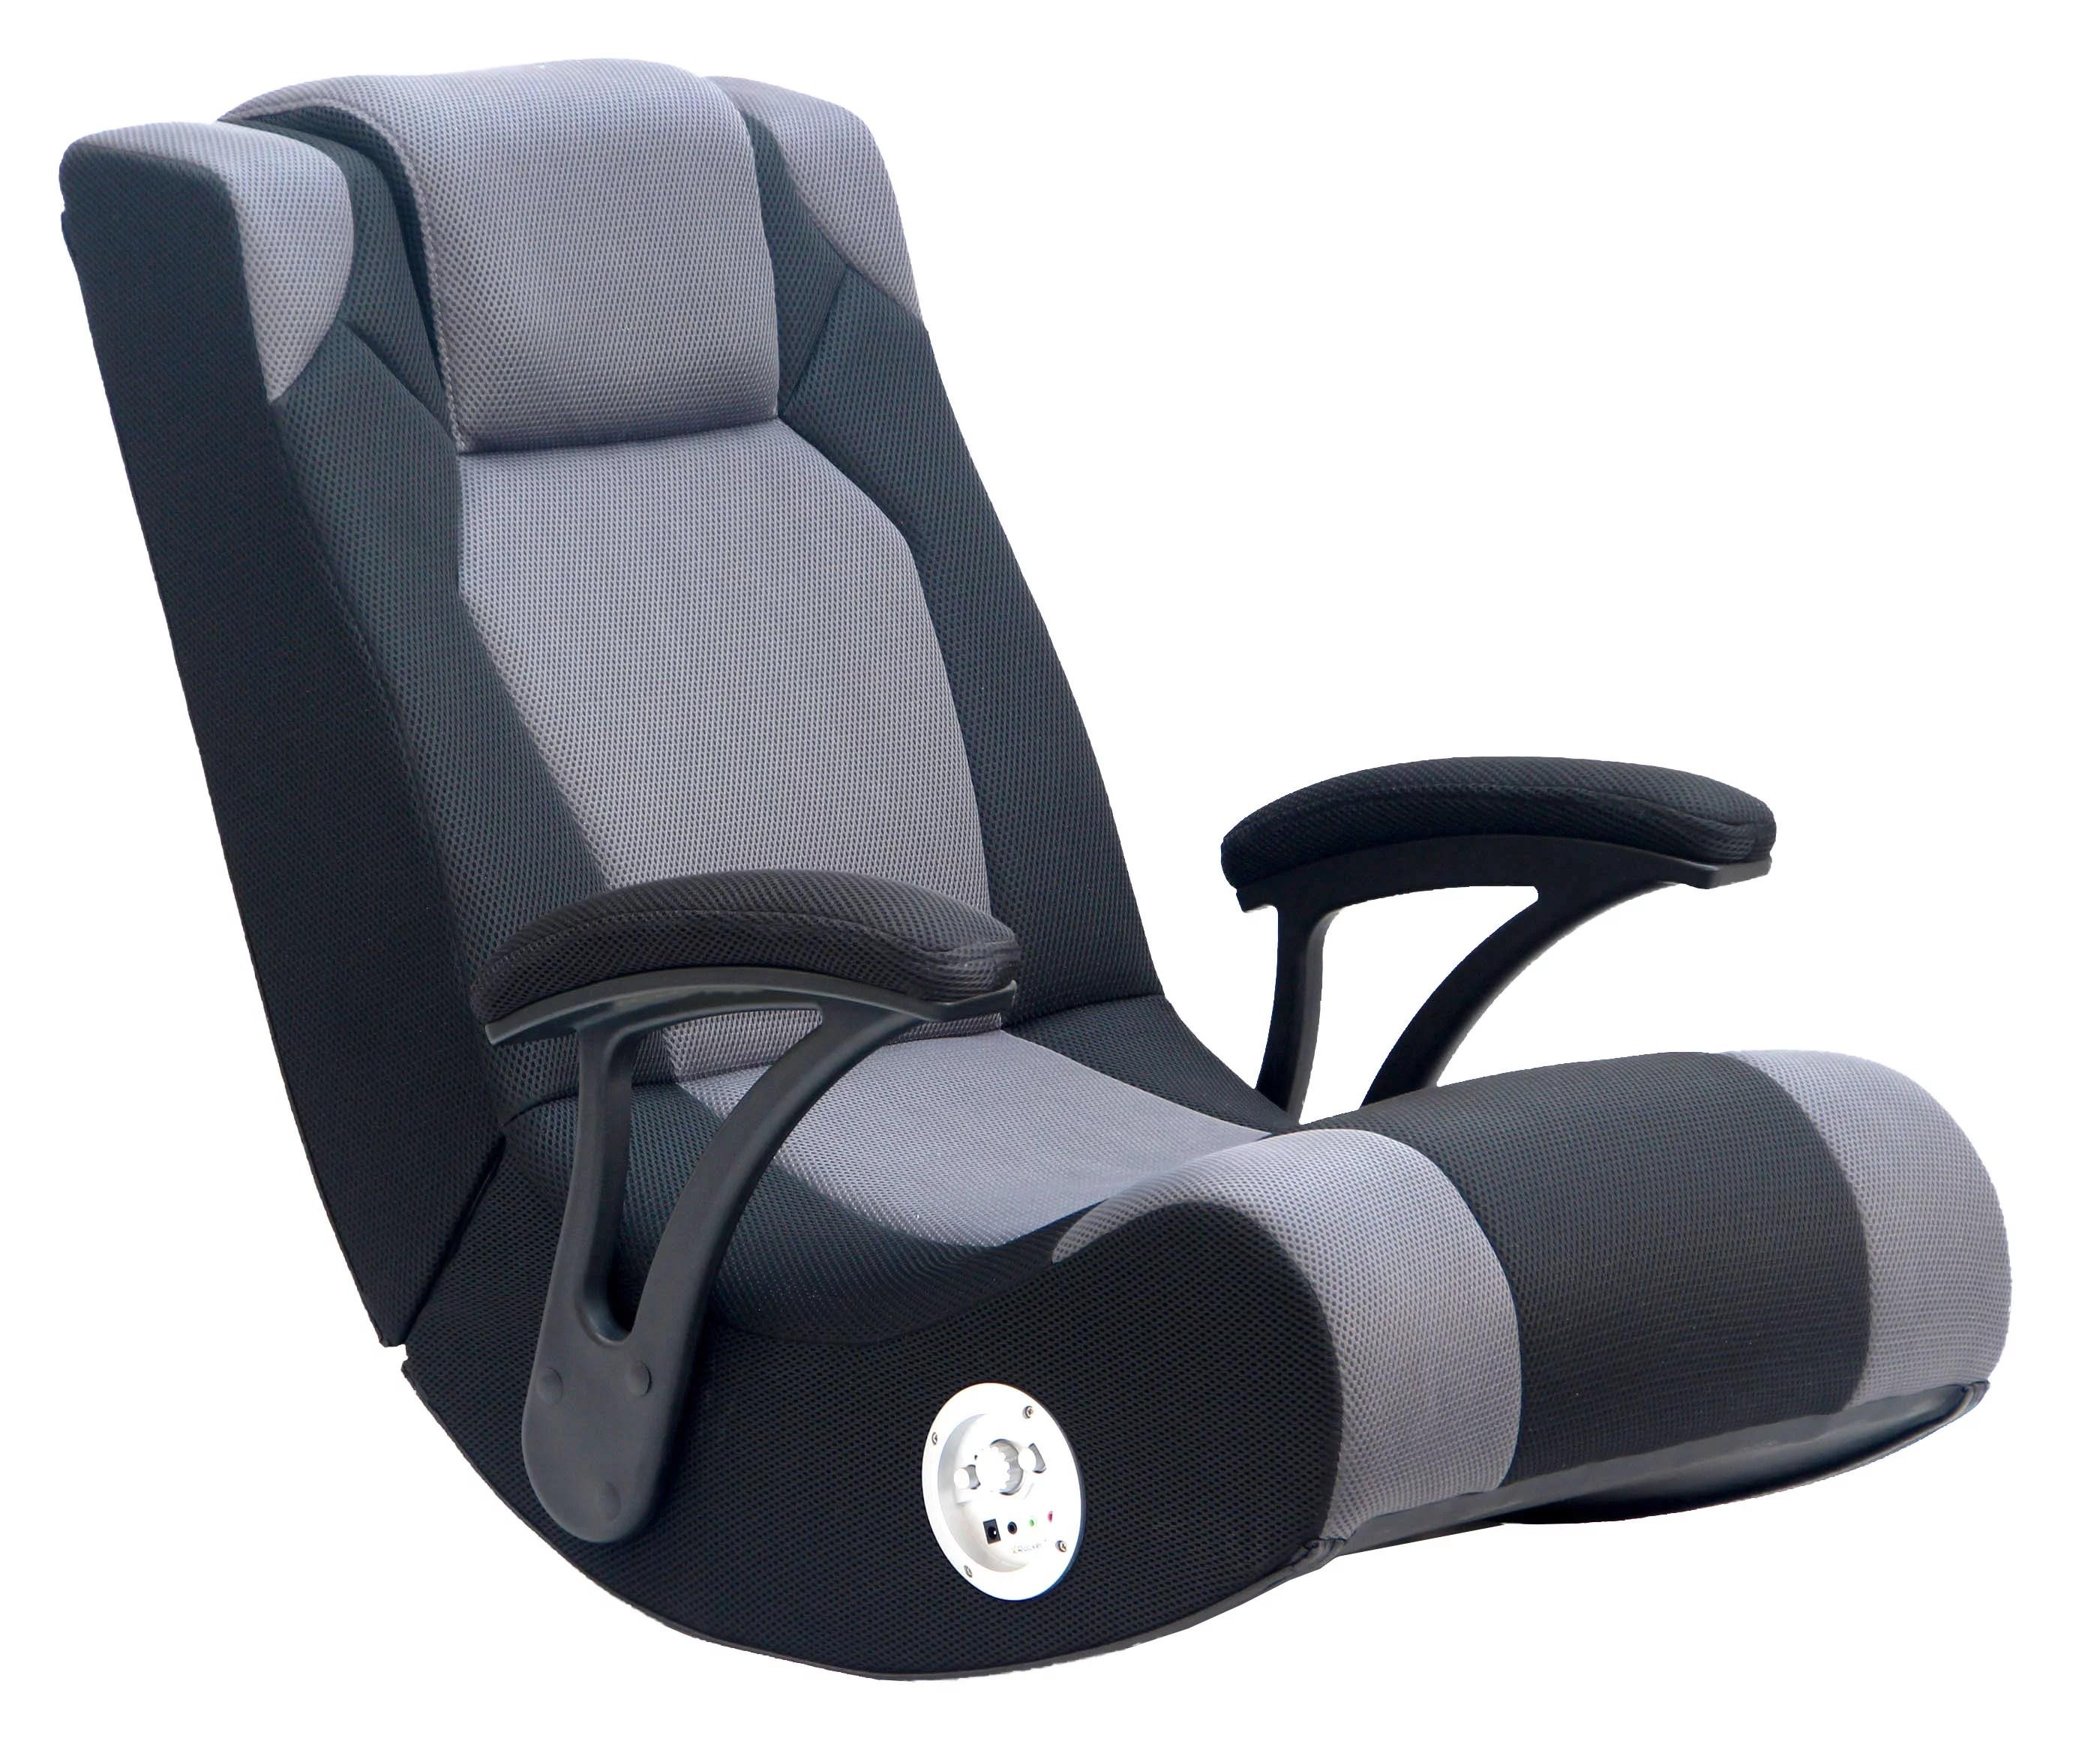 X Rocker Pro 200 Gaming Chair Rocker with Sound